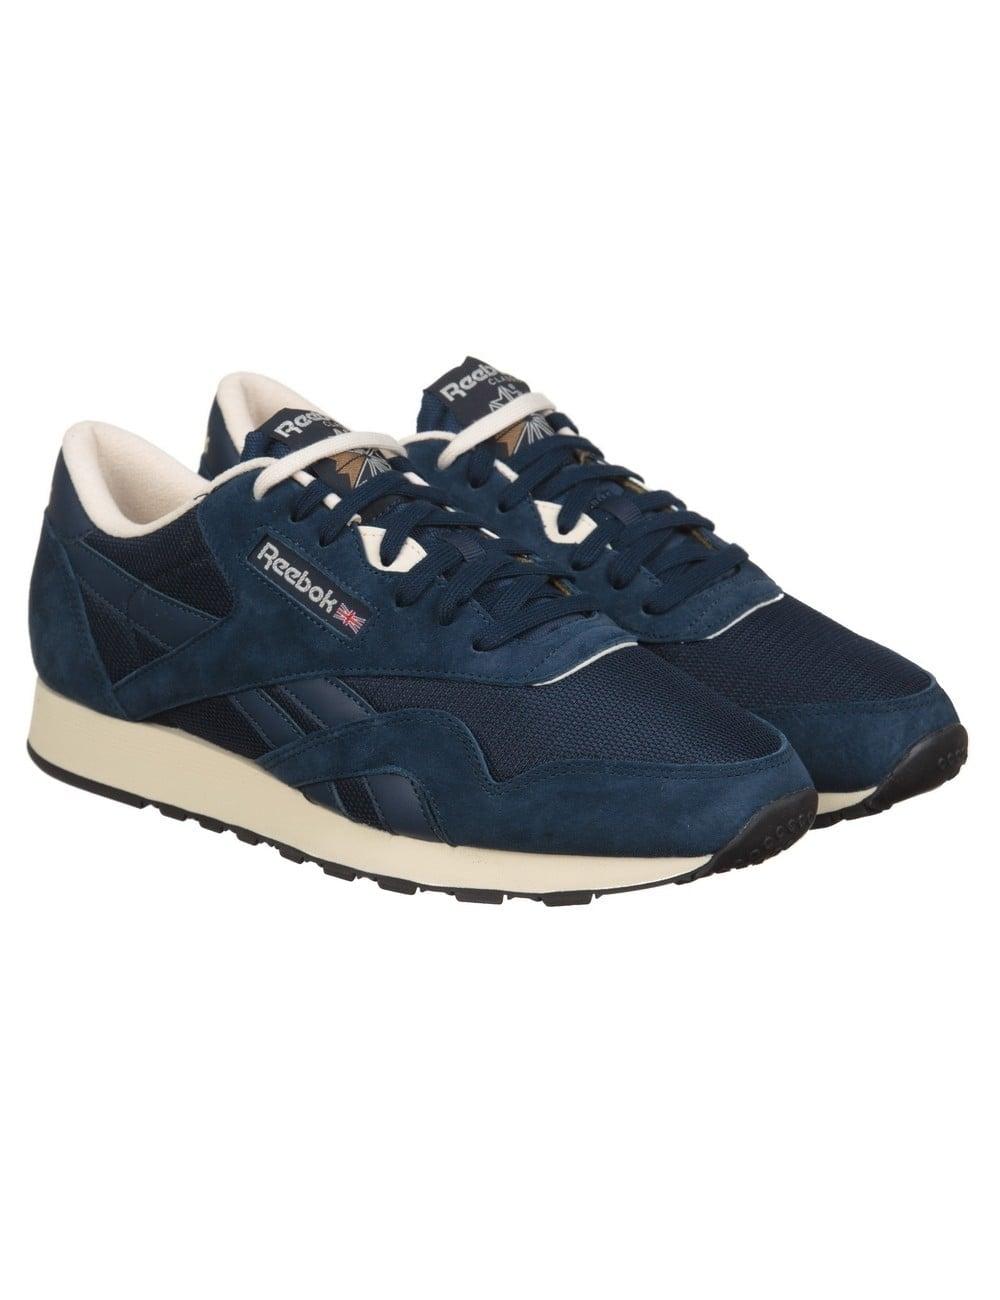 26de8925c Reebok CL Nylon P Shoes - Navy PPRW White - Footwear from Fat Buddha ...